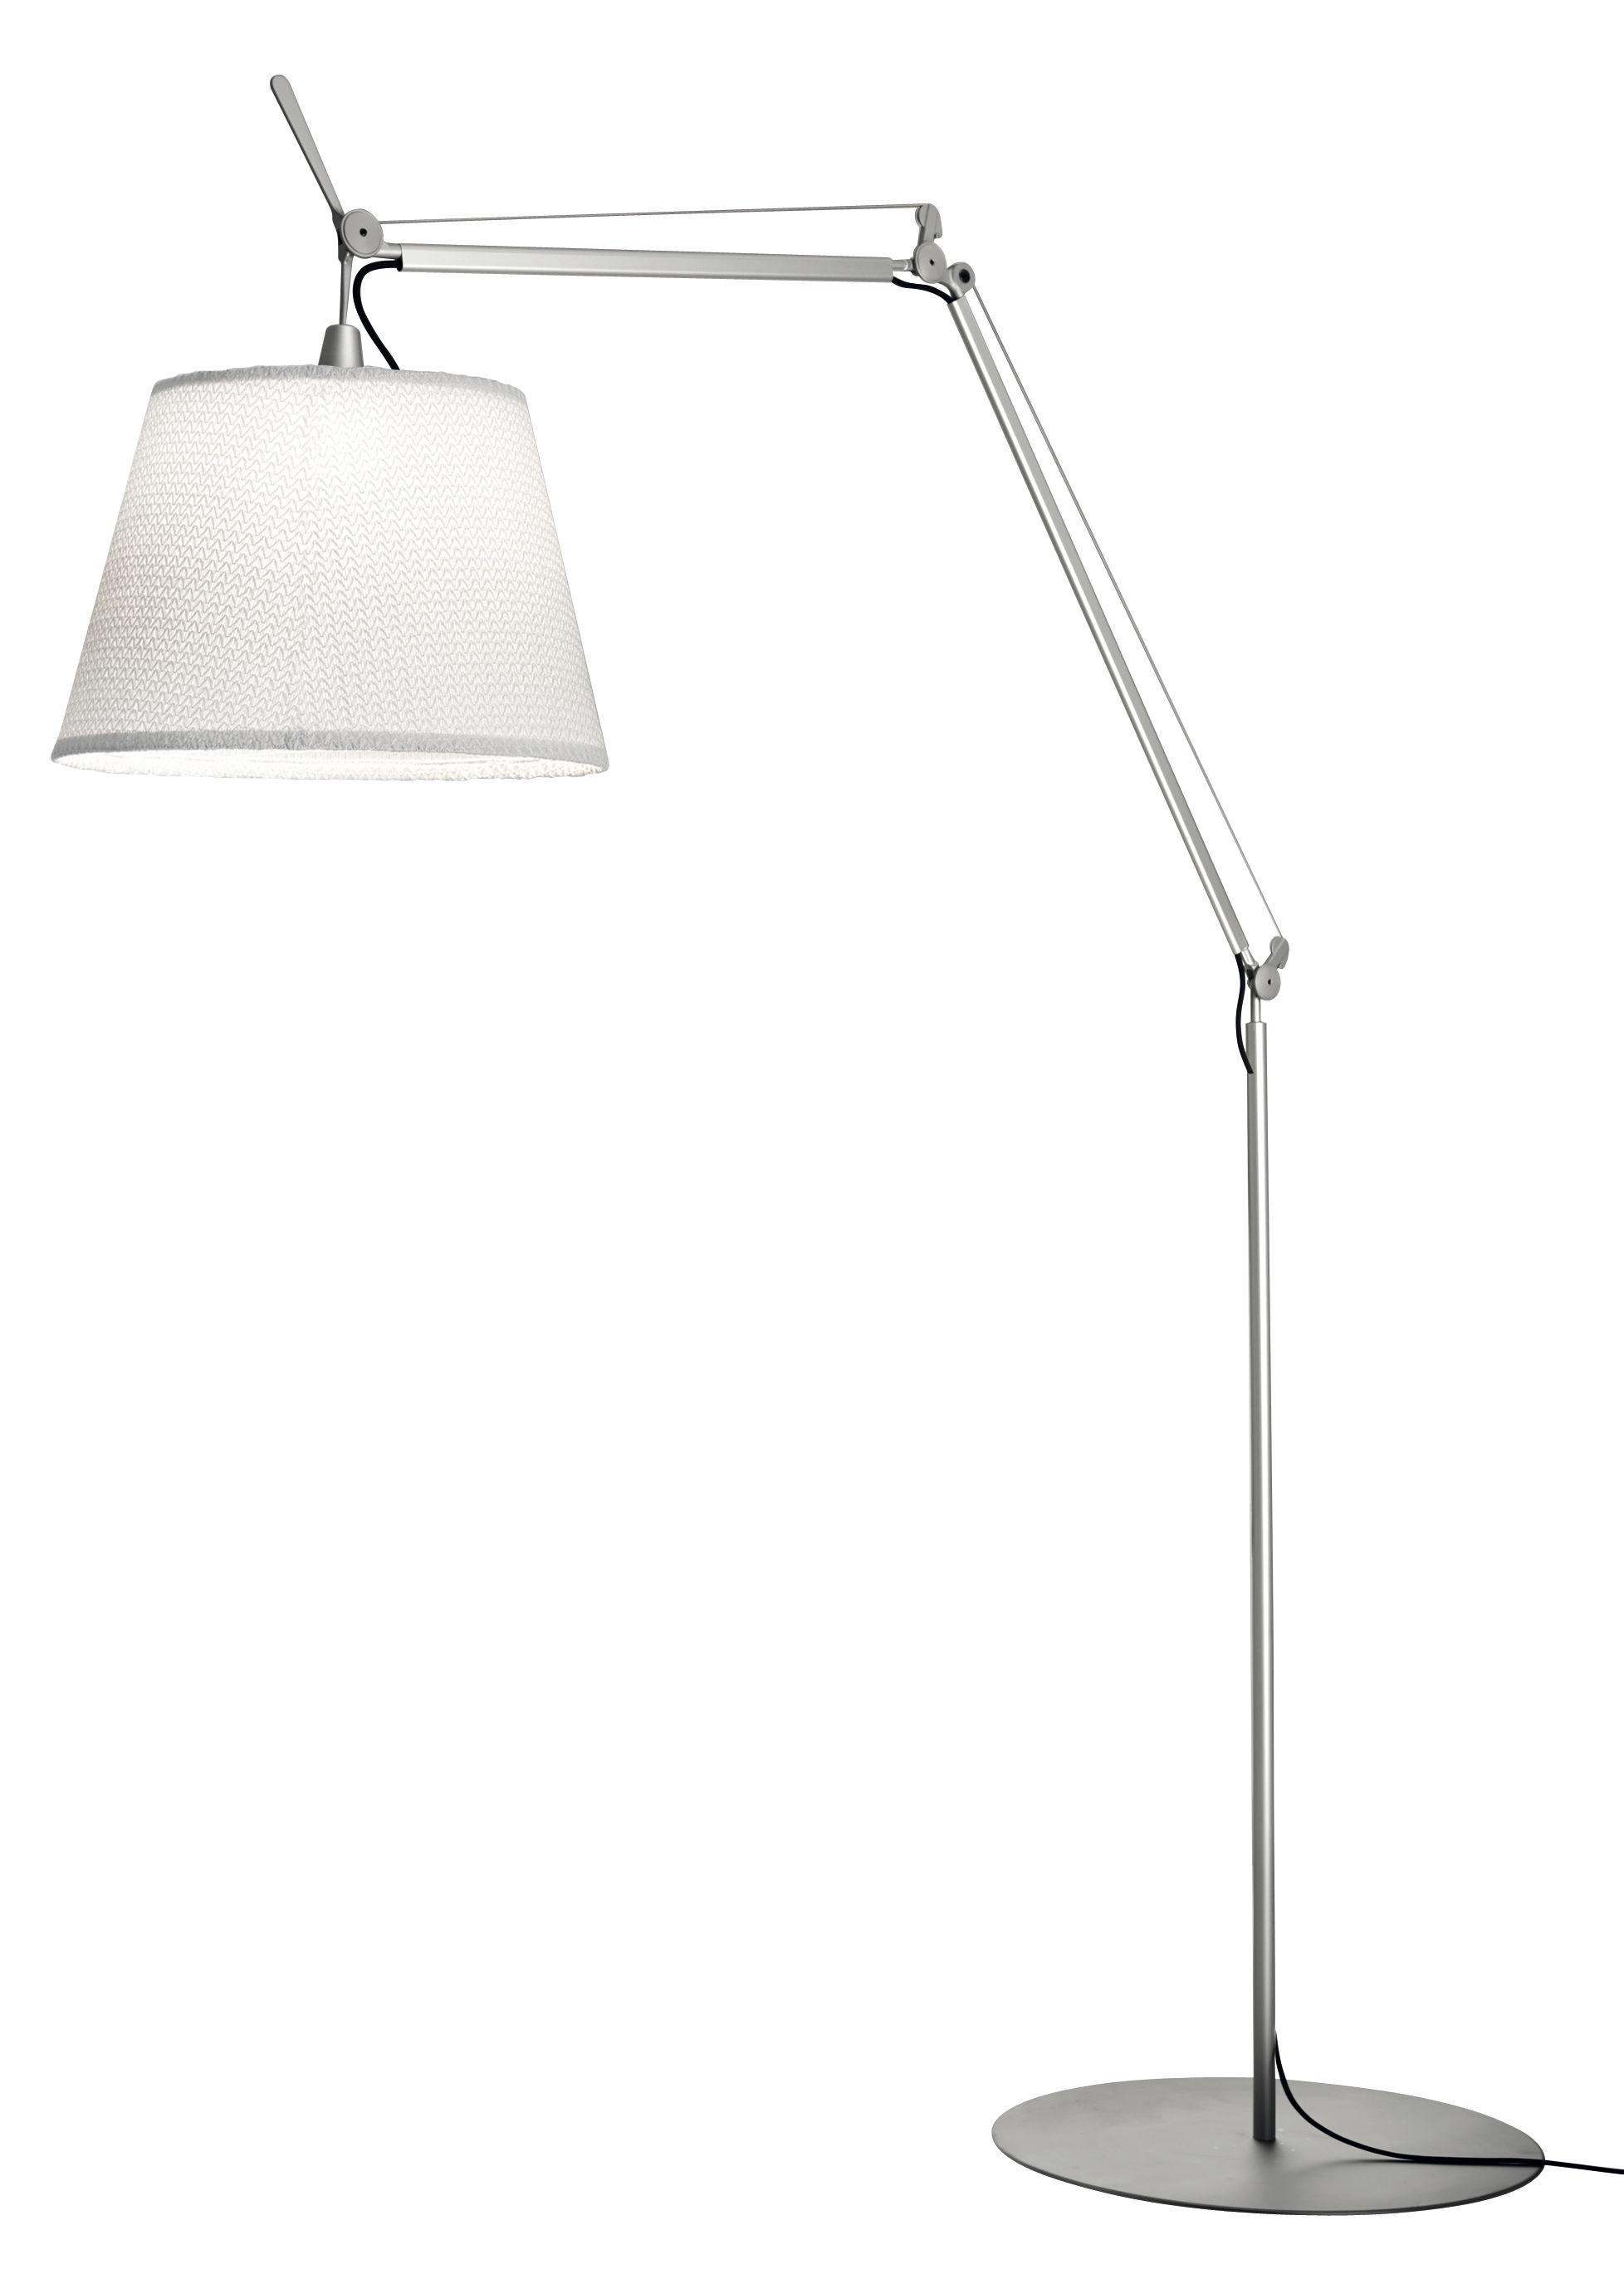 Lampadaire tolomeo paralume outdoor led h 132 298 cm for Imitazioni lampade design